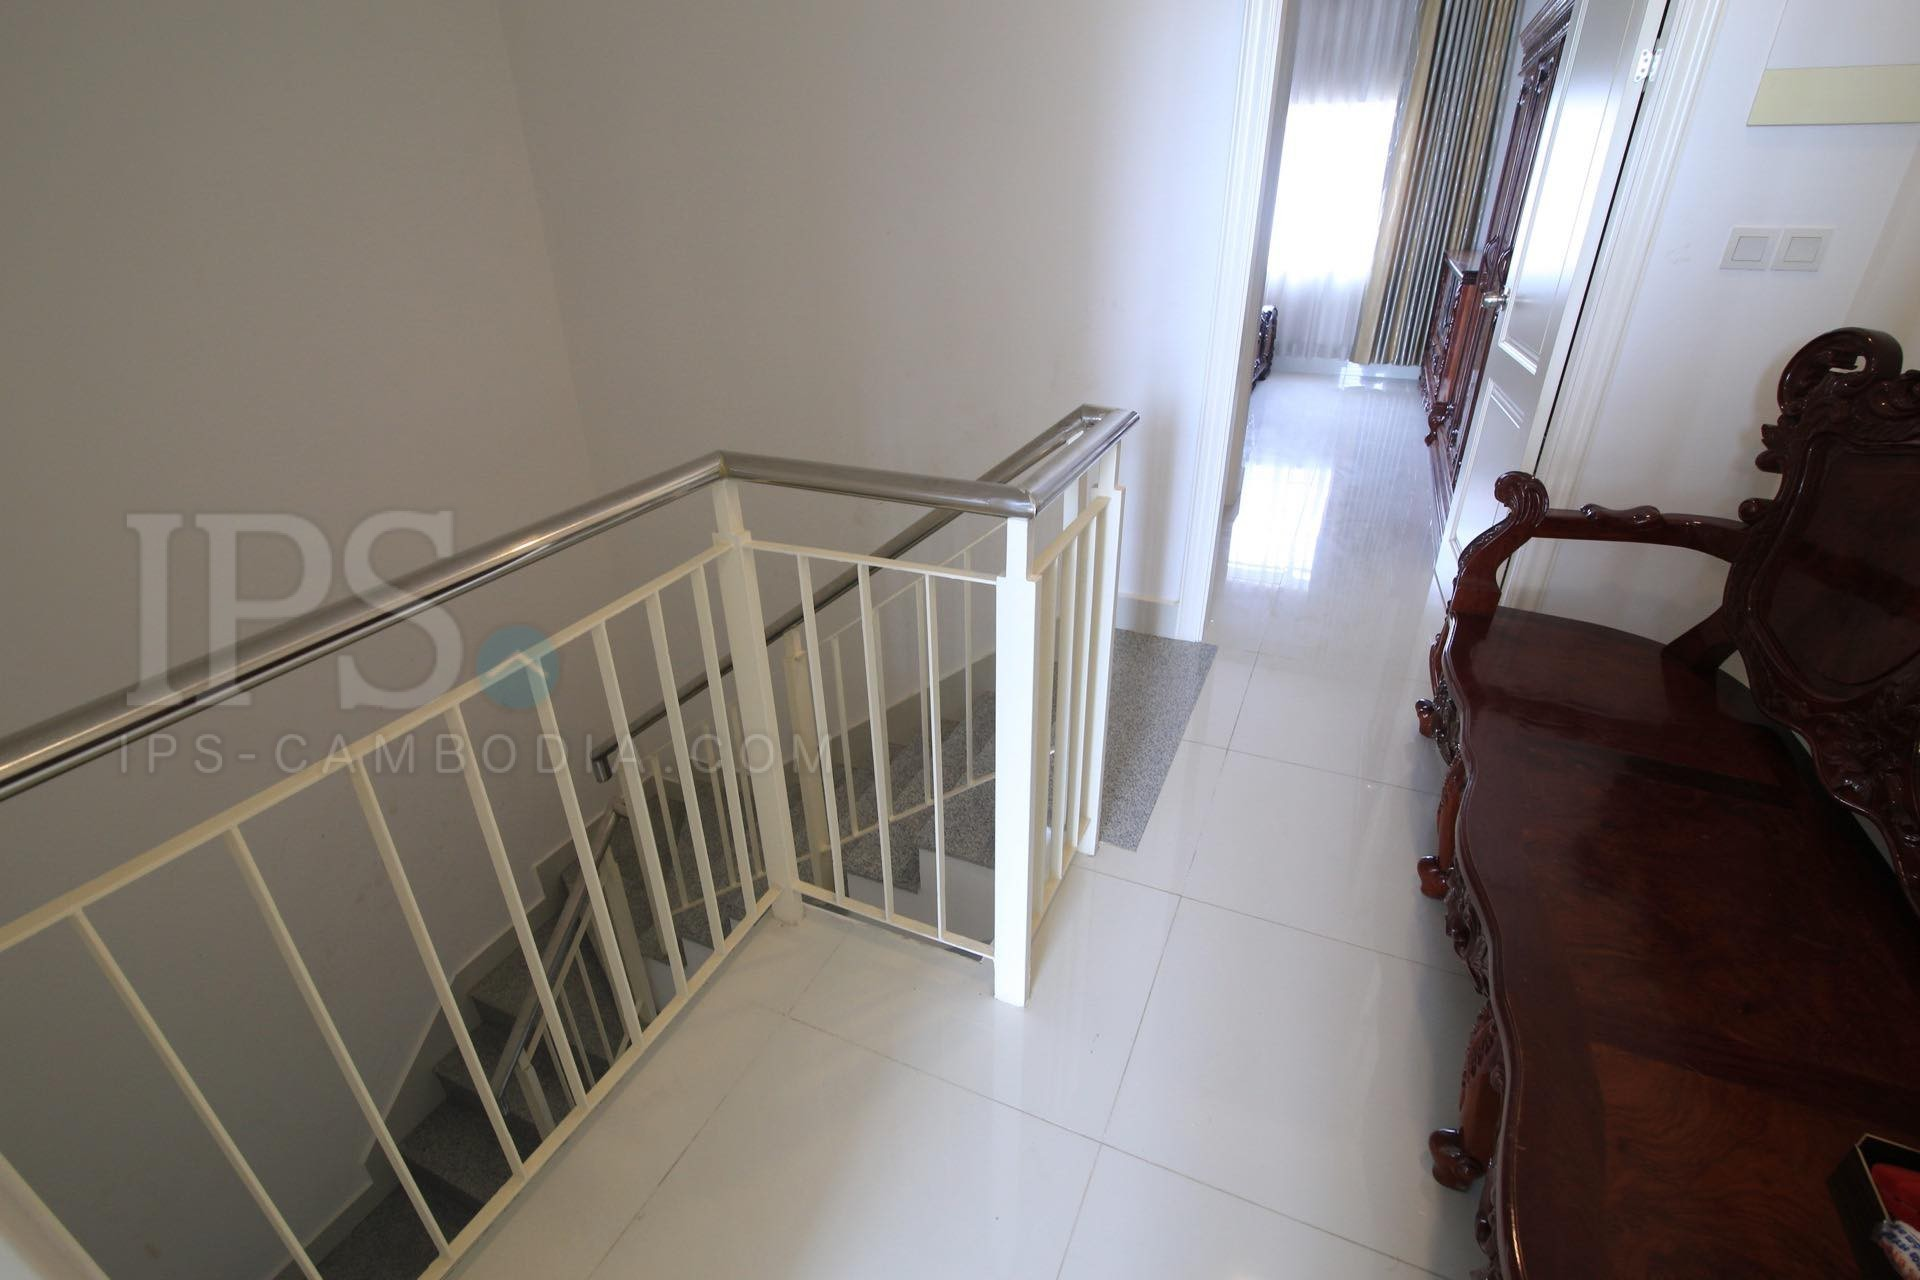 5 Bedroom Flat For Sale - Sen Sok, Phnom Penh